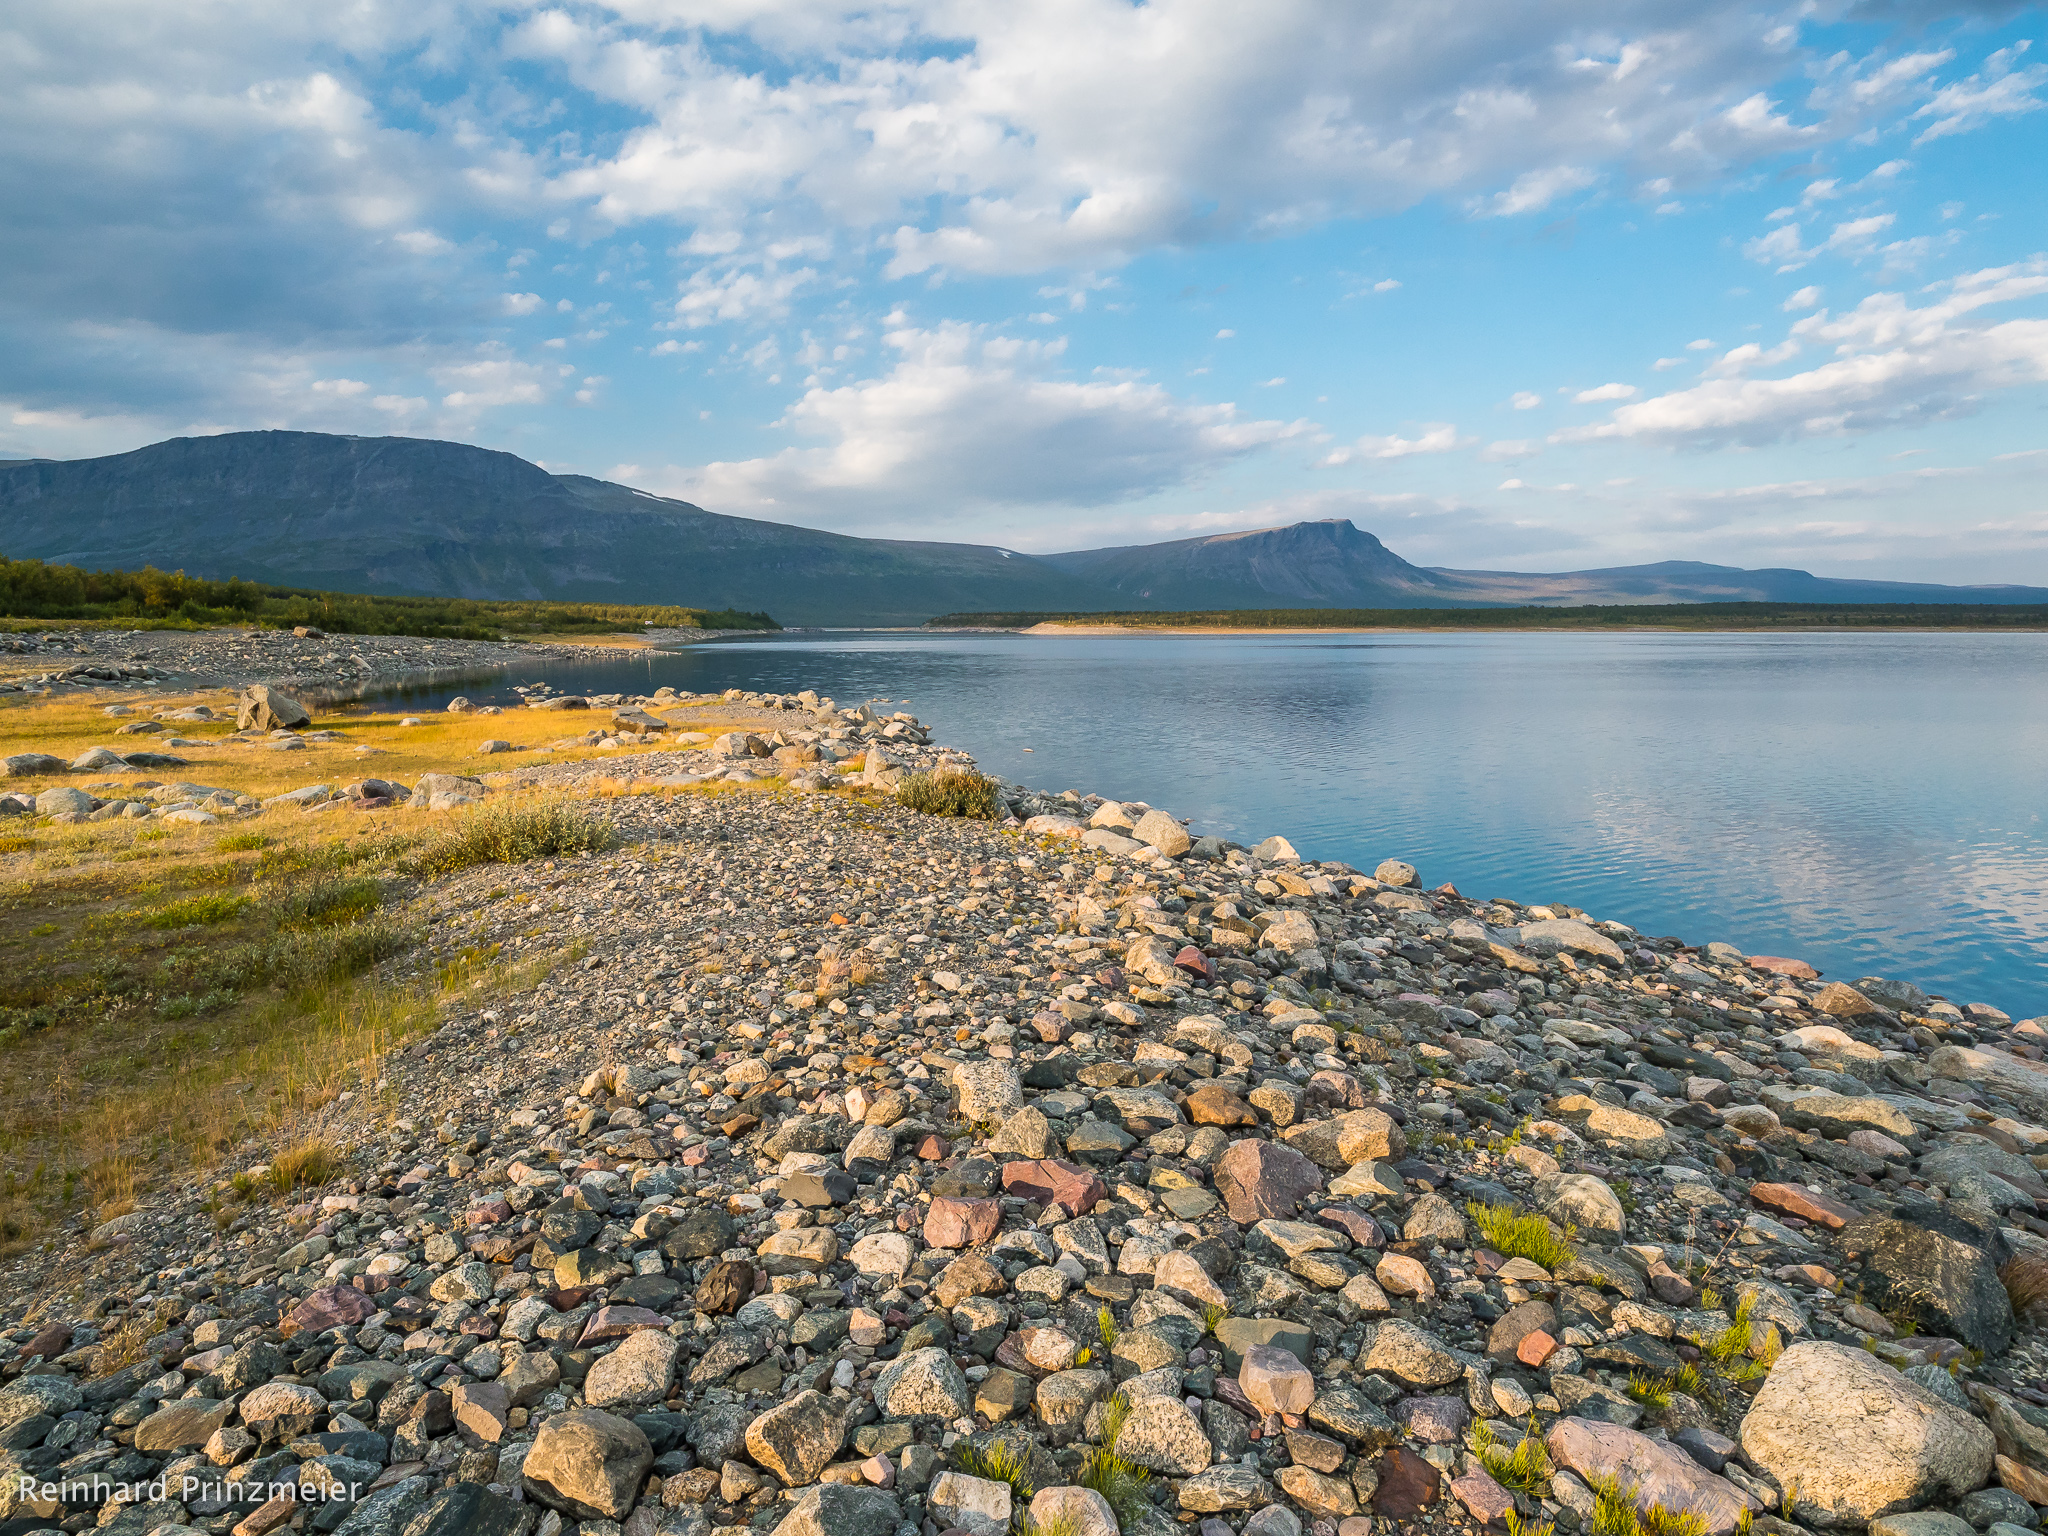 Satihaure Reservoir, Sweden